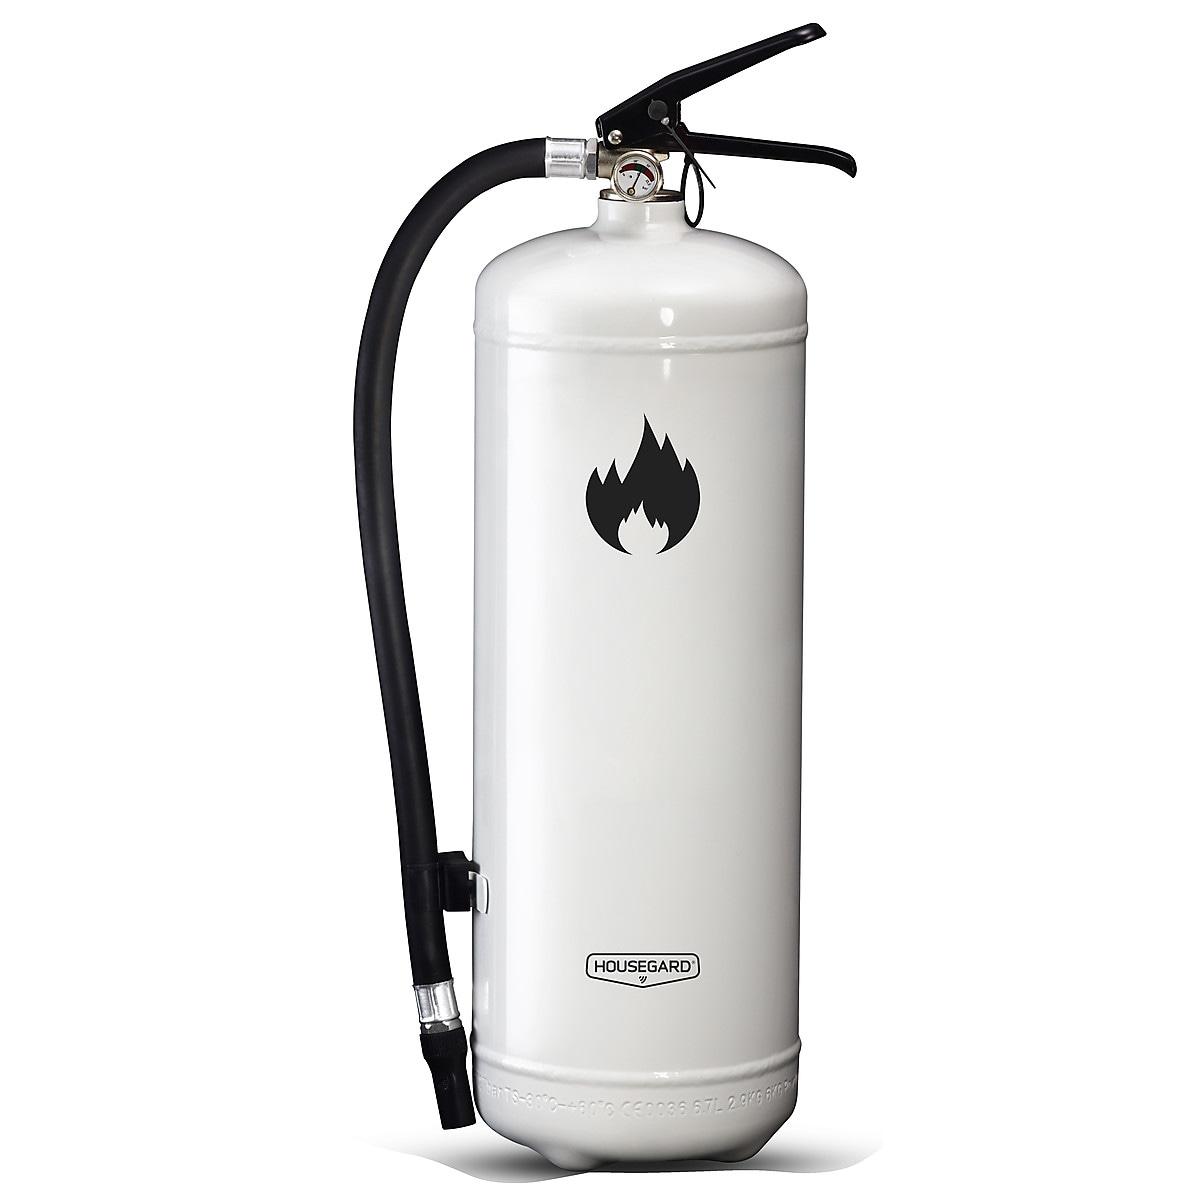 Brandsläckare 6 kg Housegard